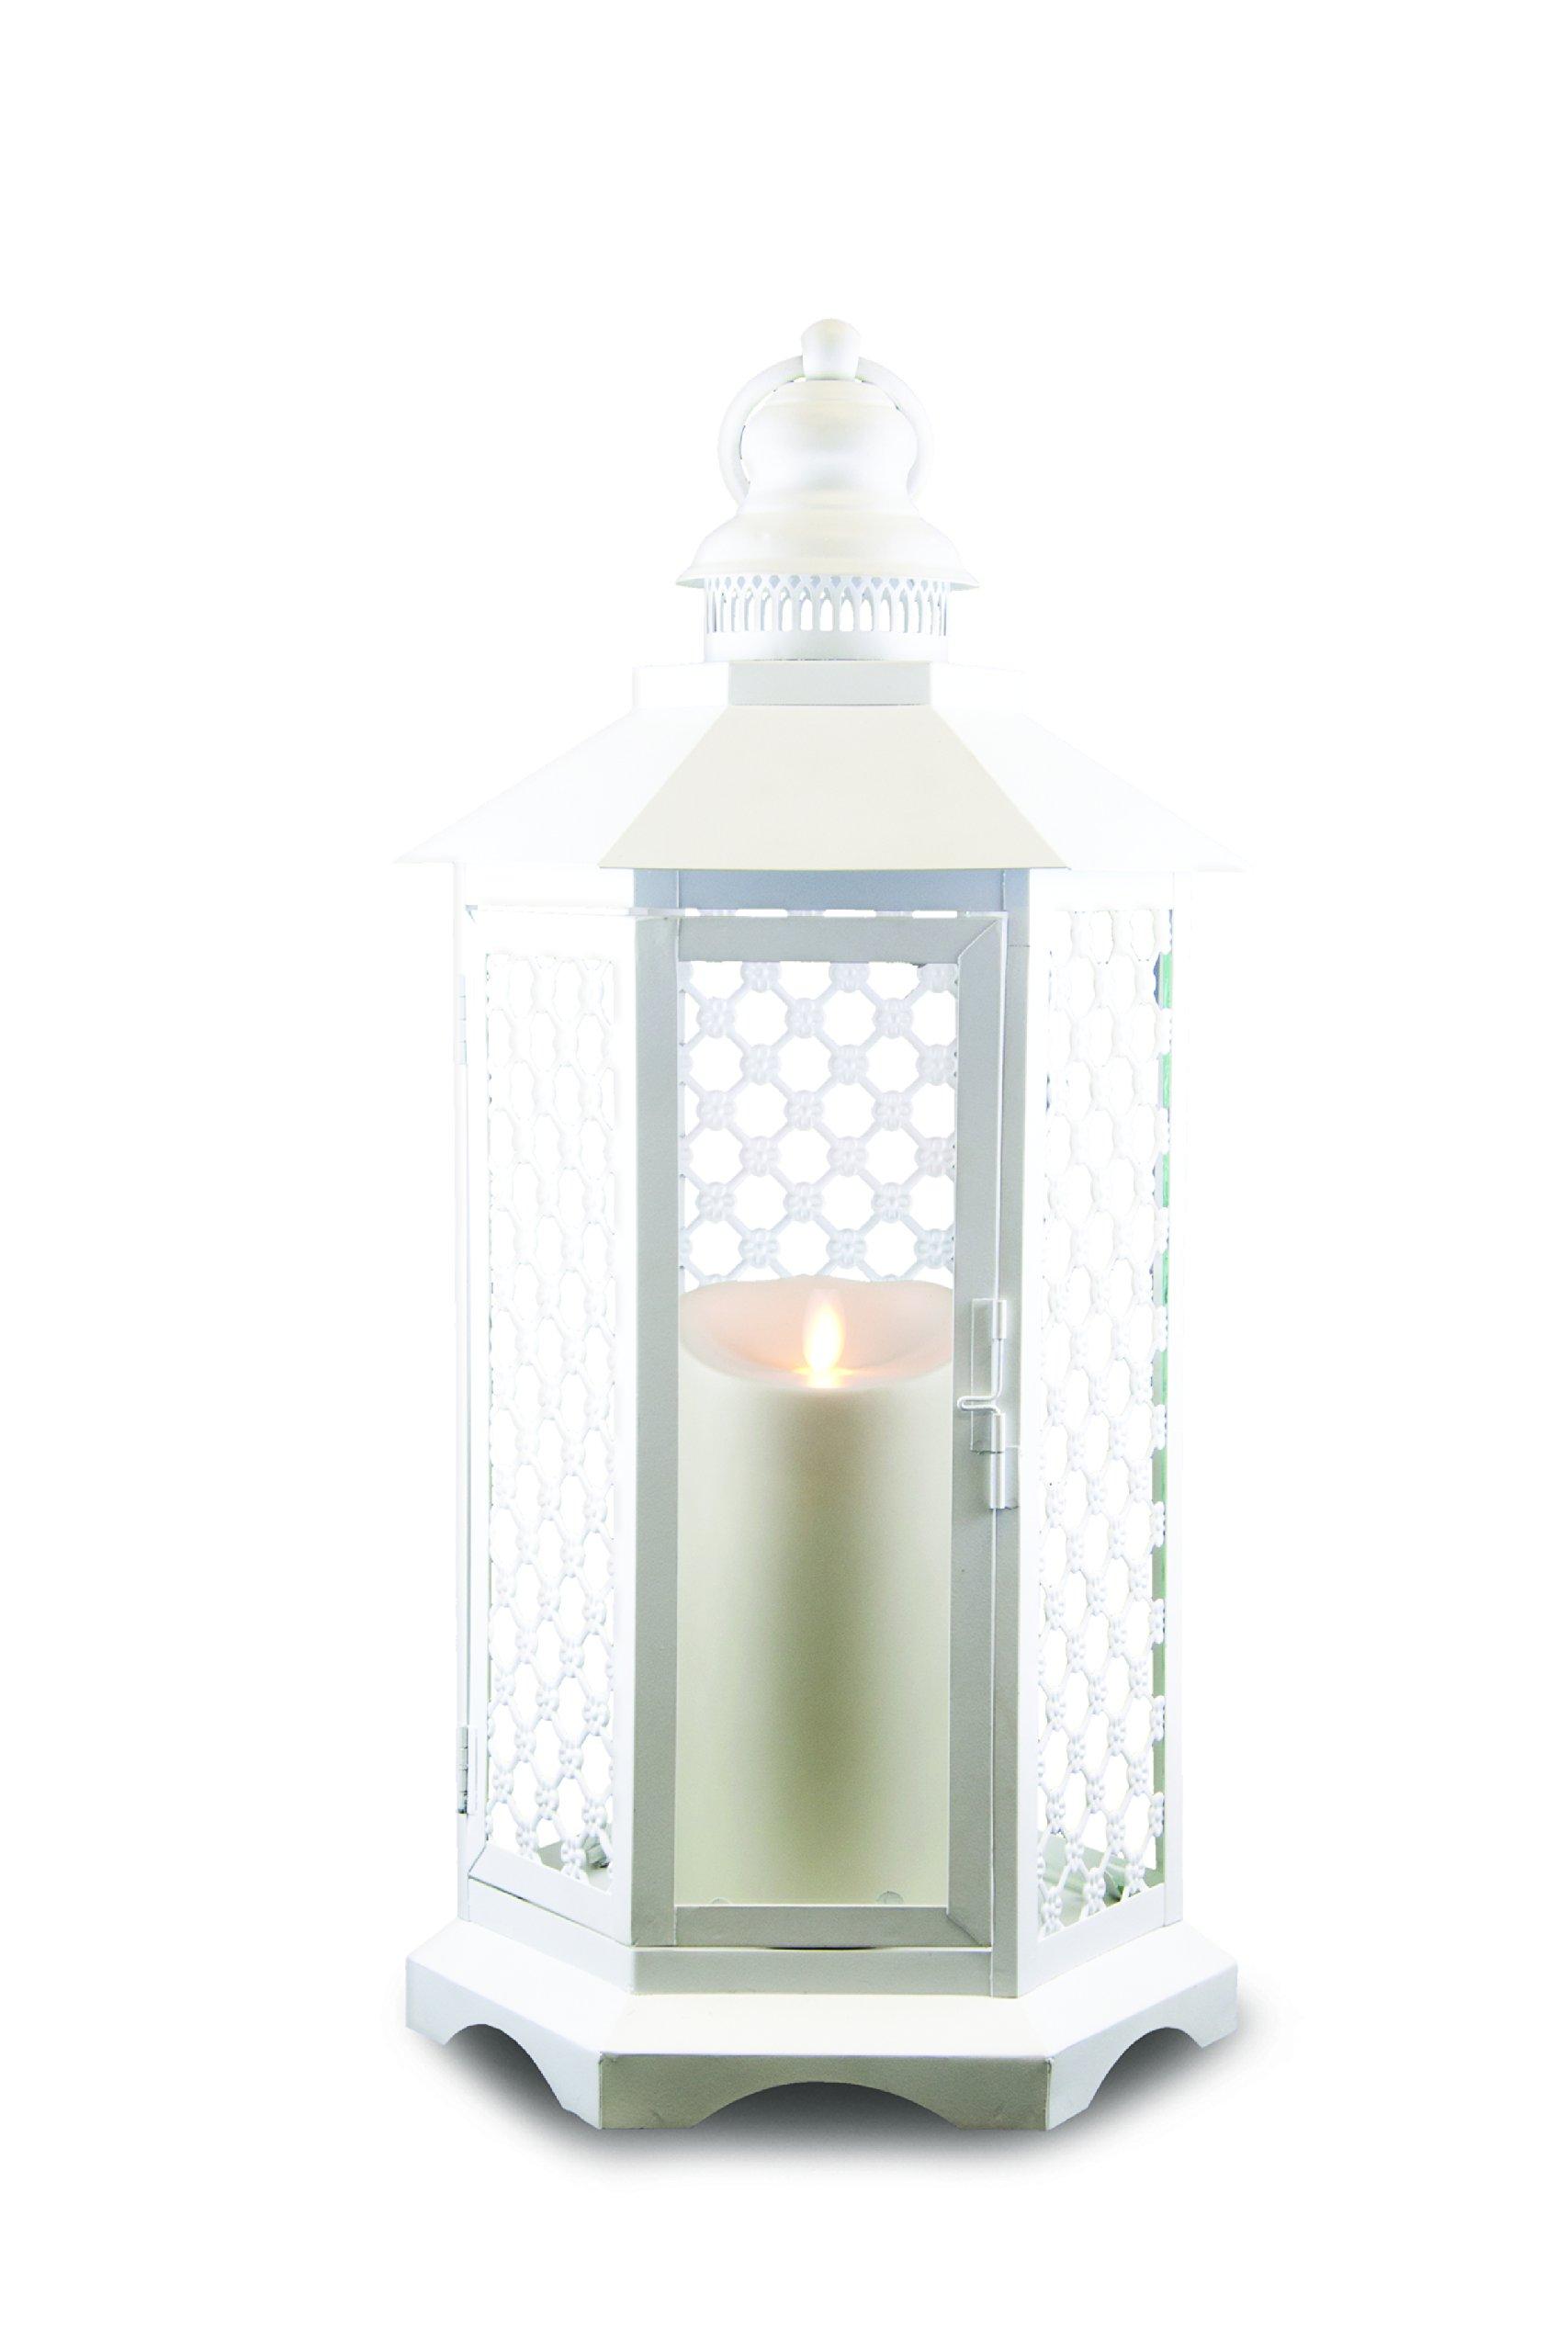 GKI/Bethlehem Lighting Lattice Luminara Lantern, 19-Inch, White